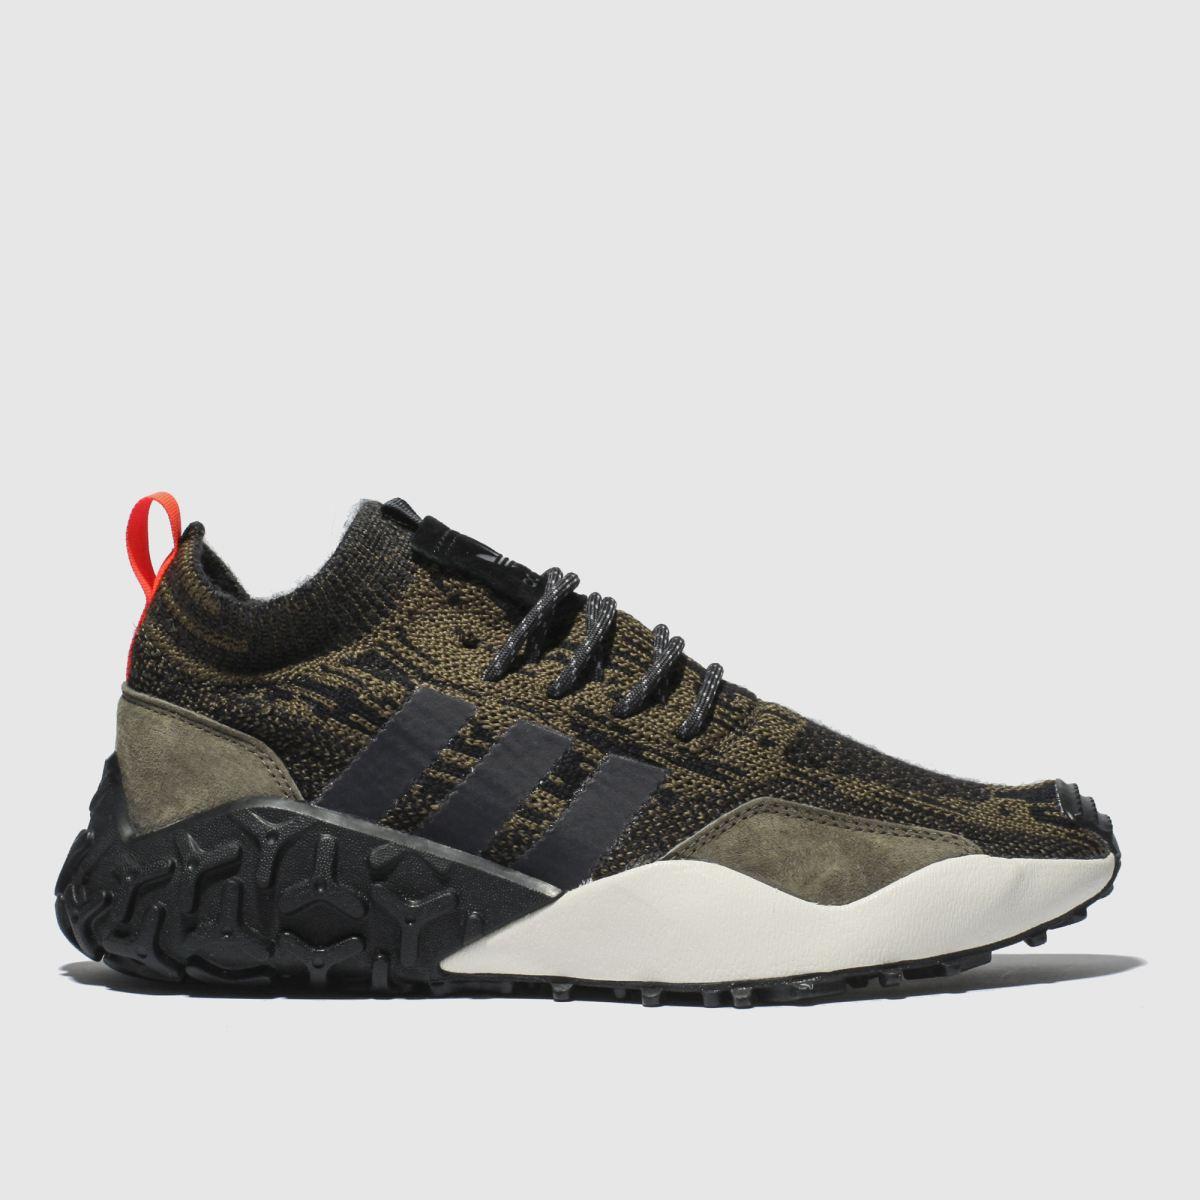 Adidas Brown F/2 Tr Primeknit Trainers